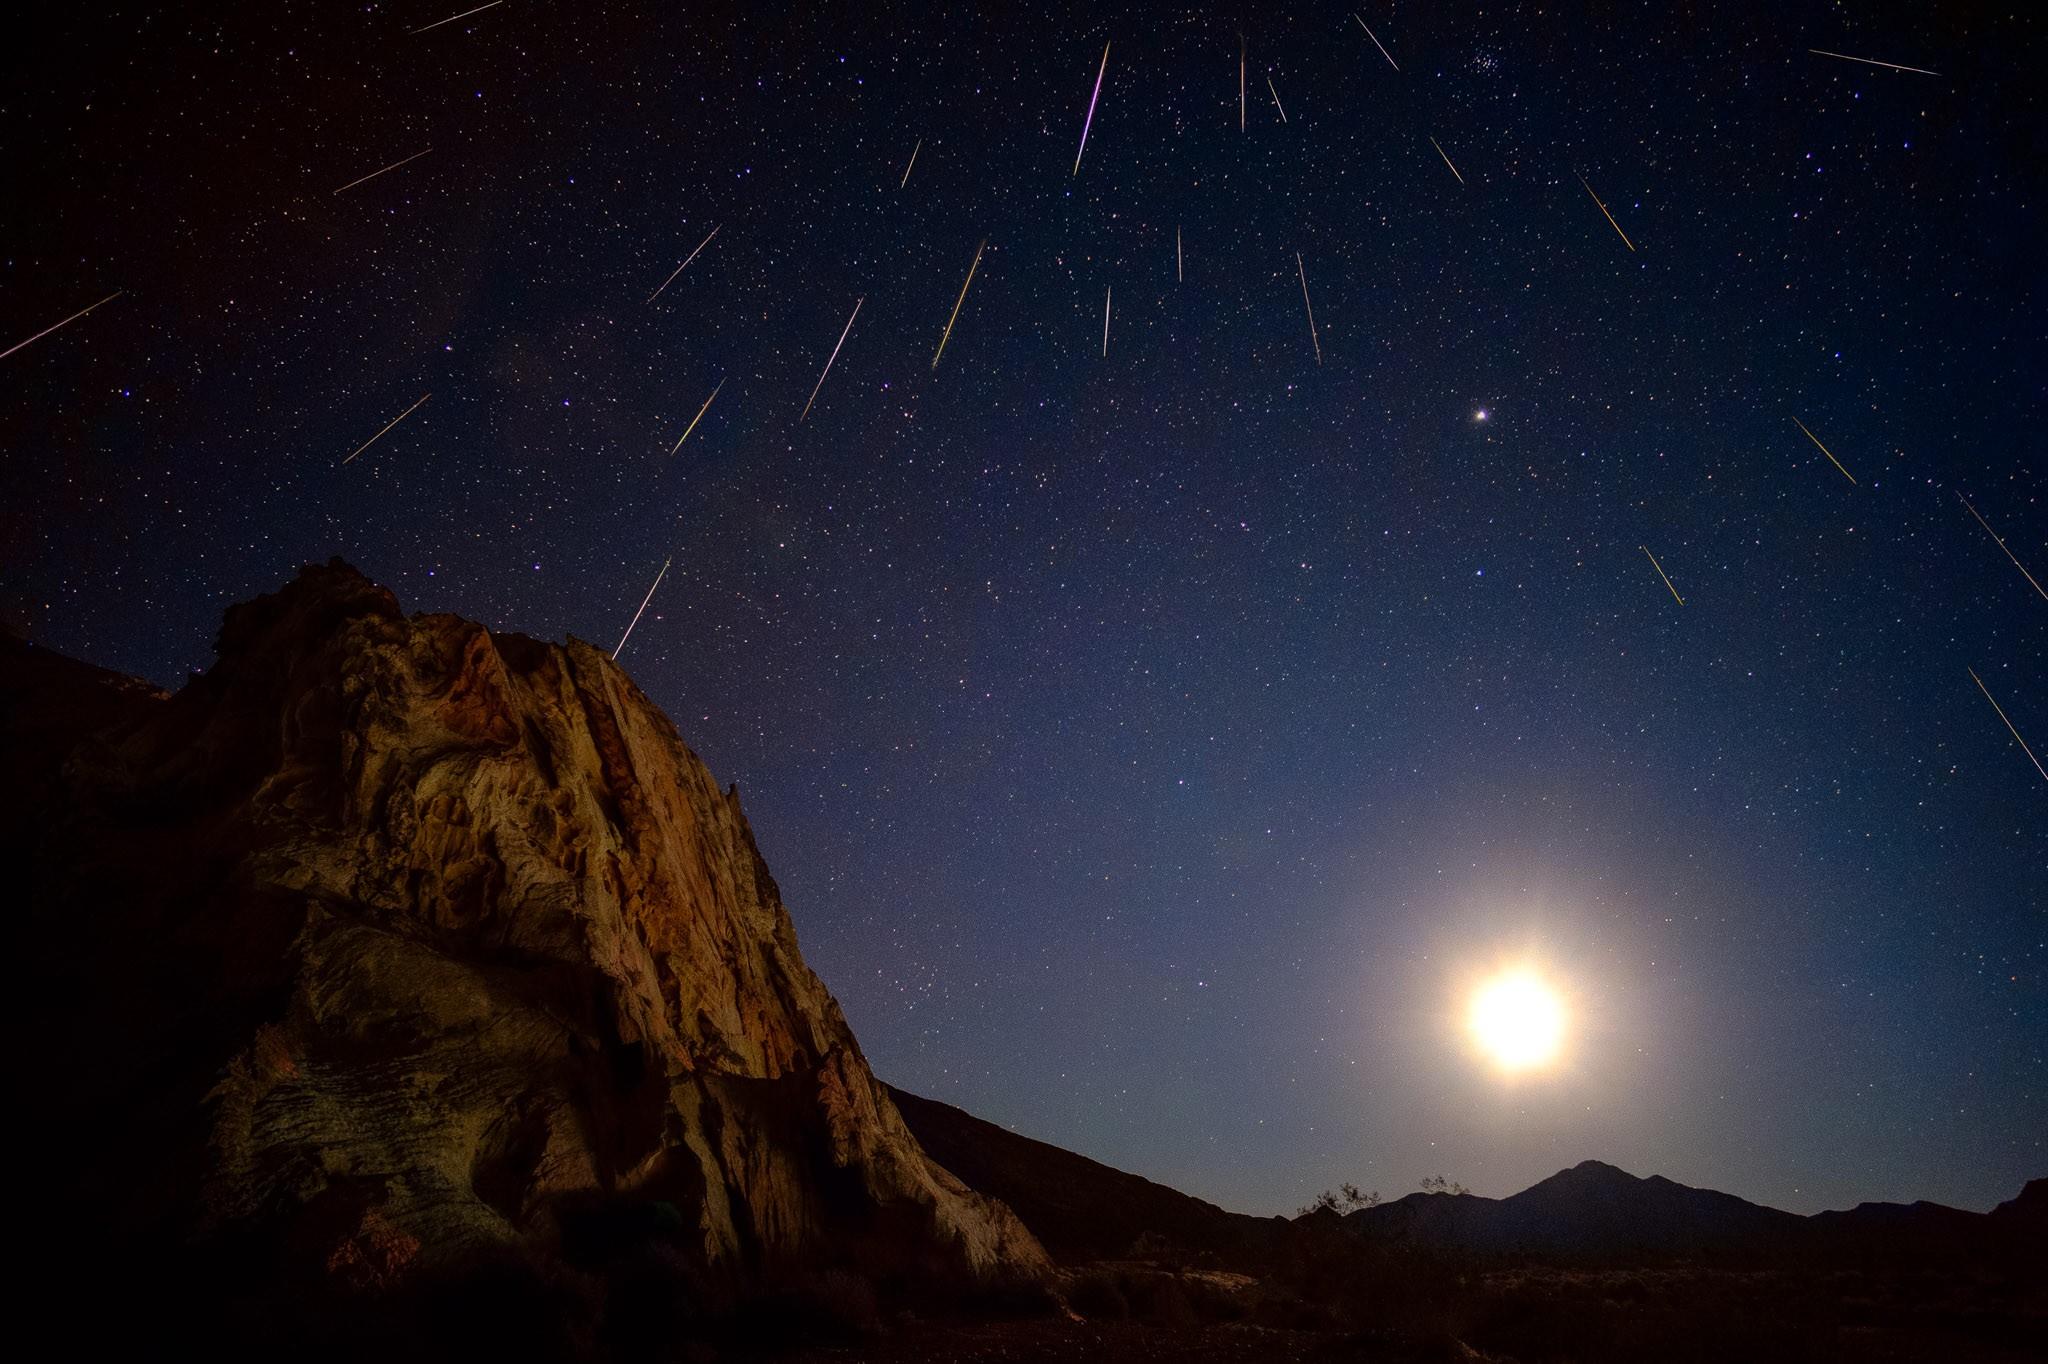 Chuva de meteoros Geminídeas de 2014 nos EUA (Foto: David Kingham/flickr/creative commons)